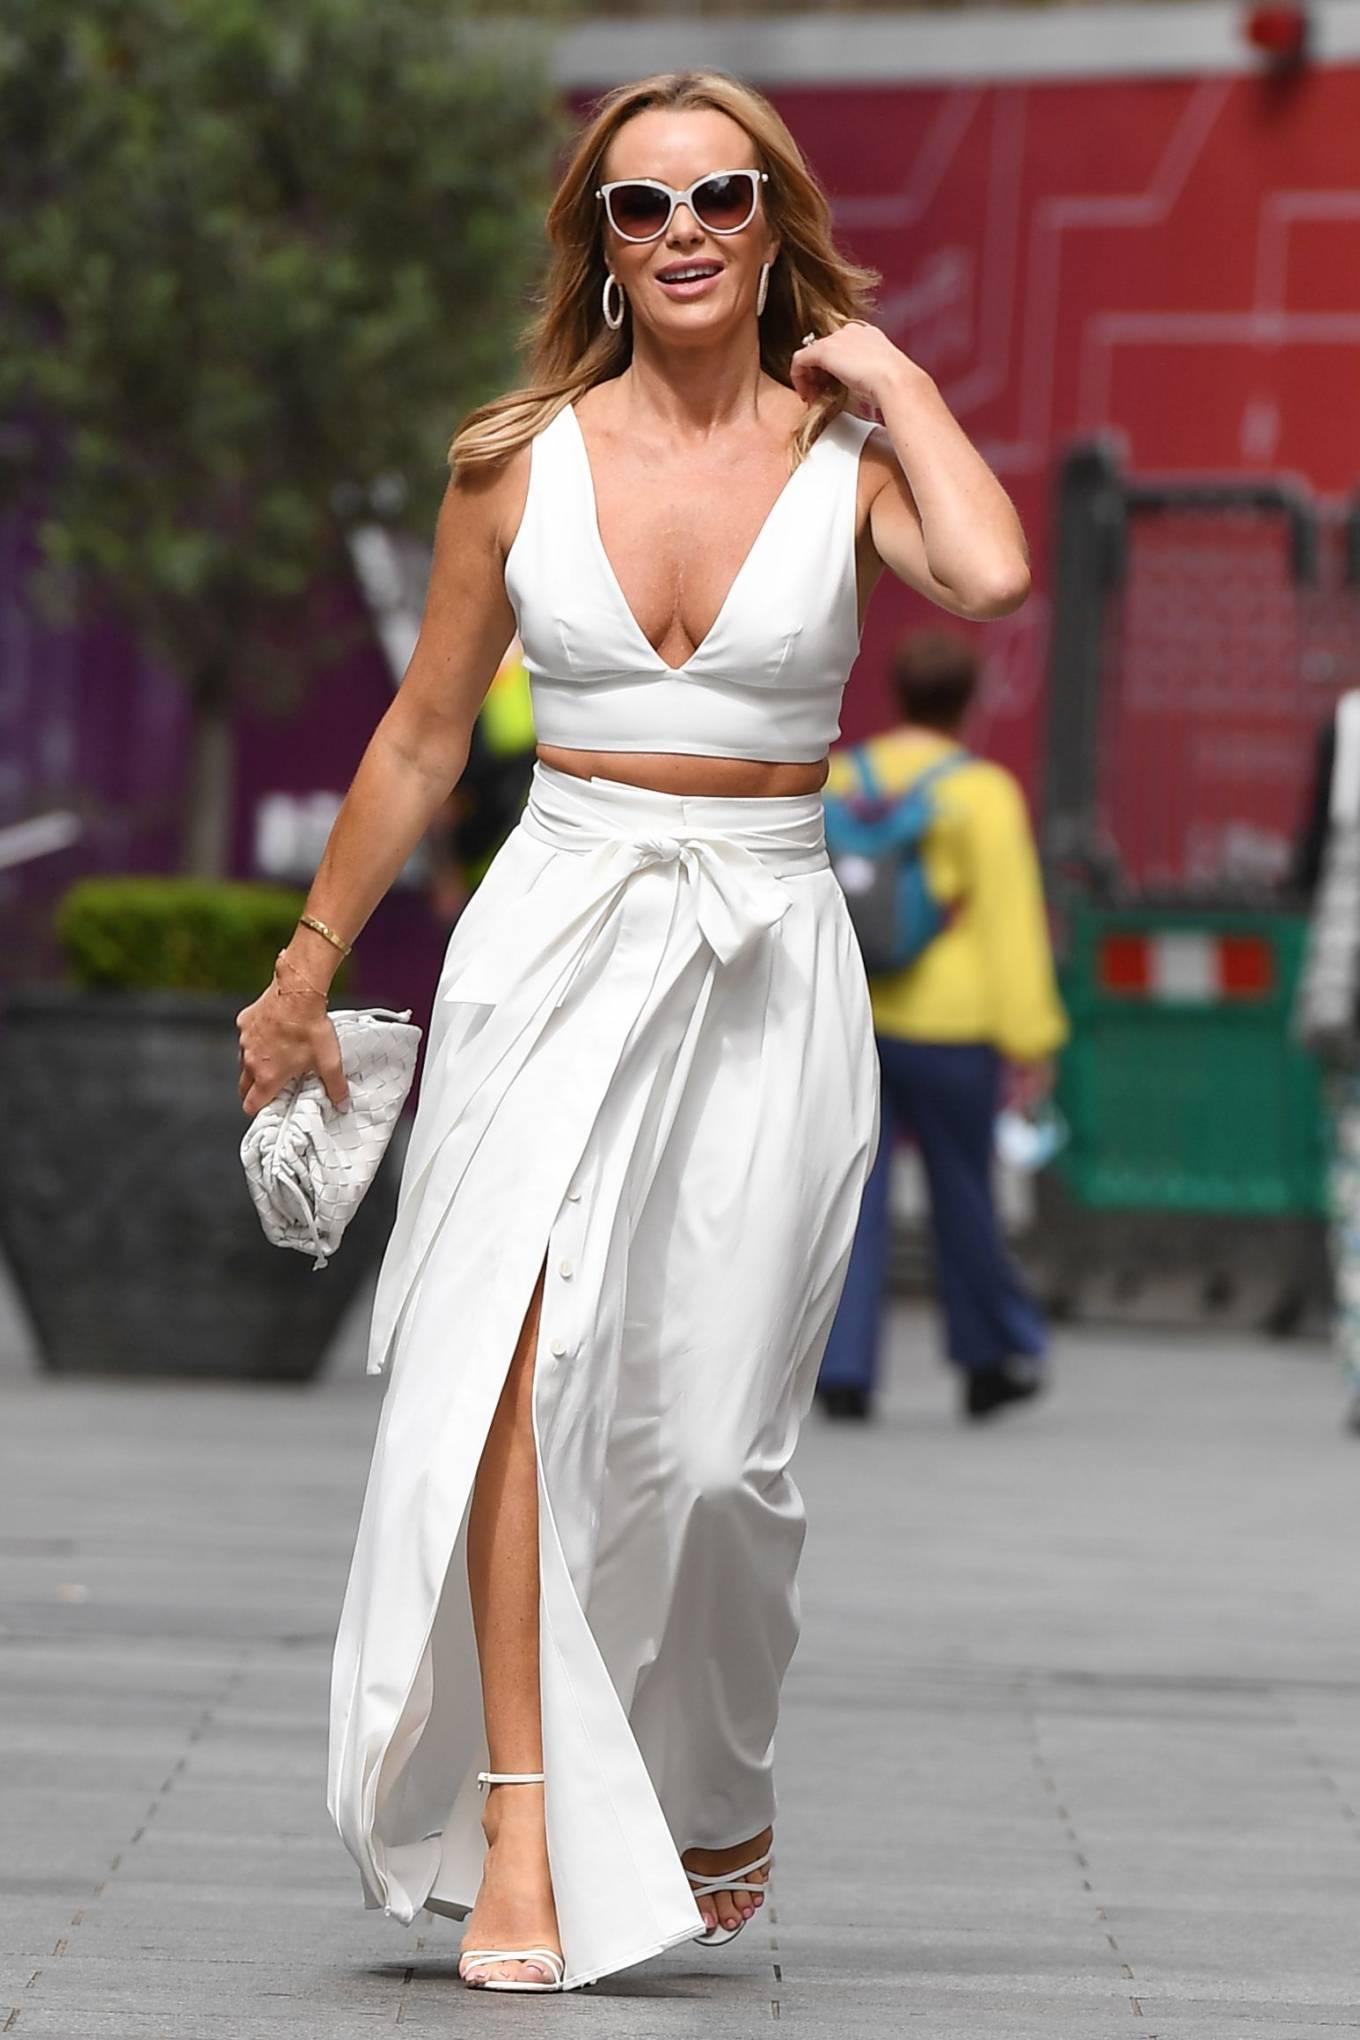 Amanda Holden 2021 : Amanda Holden – In a white dress at Global Studios in London-15